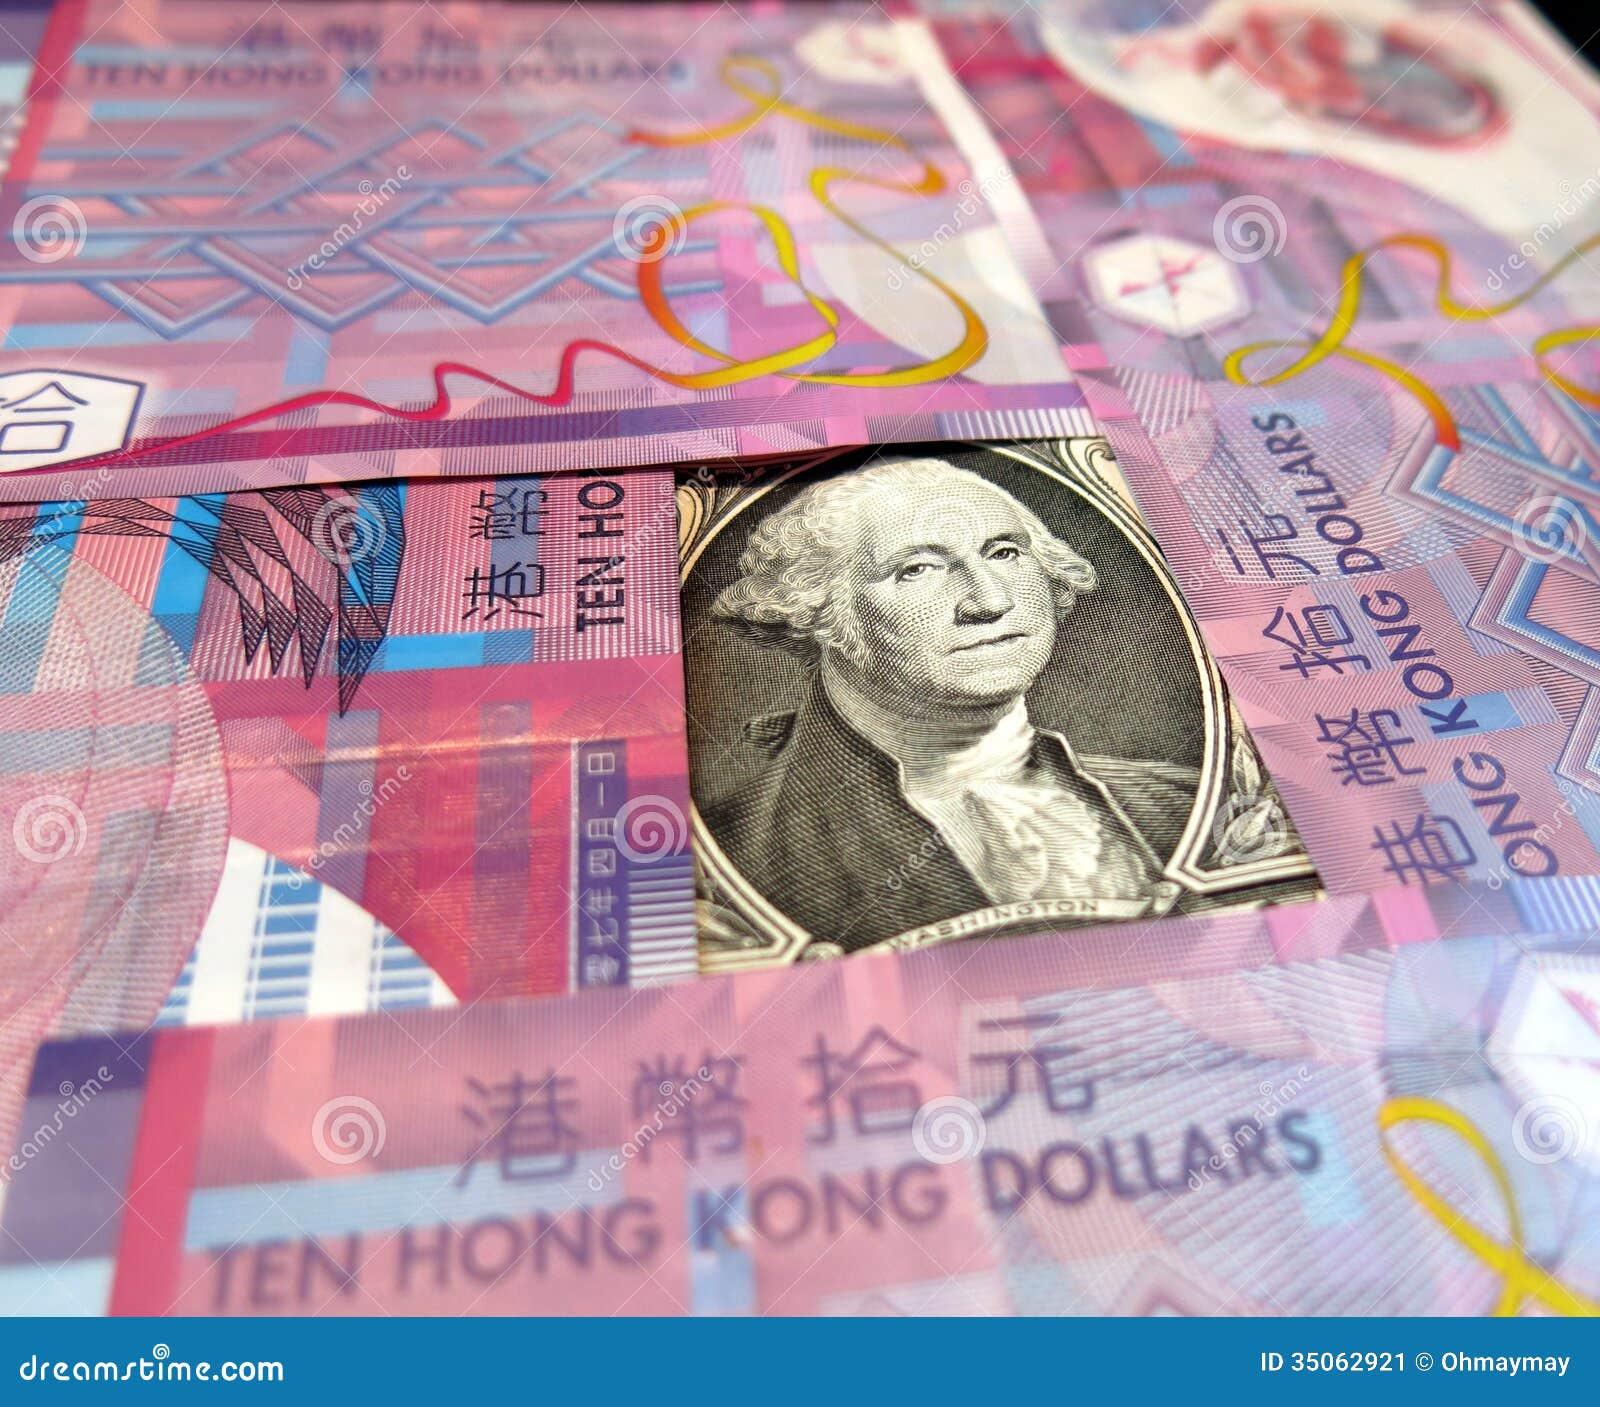 hong kong monetary authority exchange rate